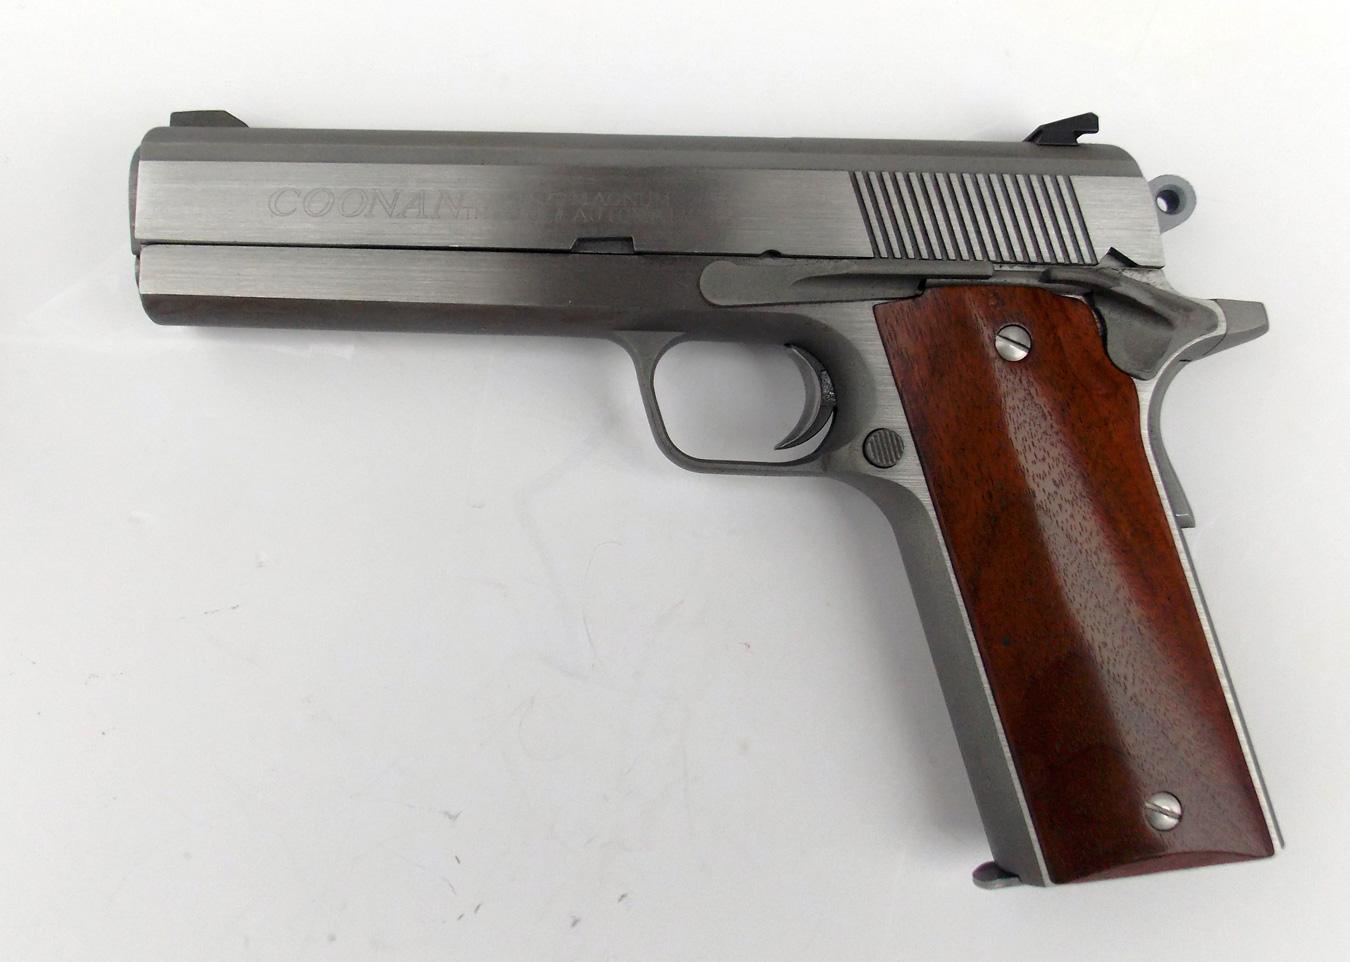 Coonan .357 magnum 1911-style handgun, left profile